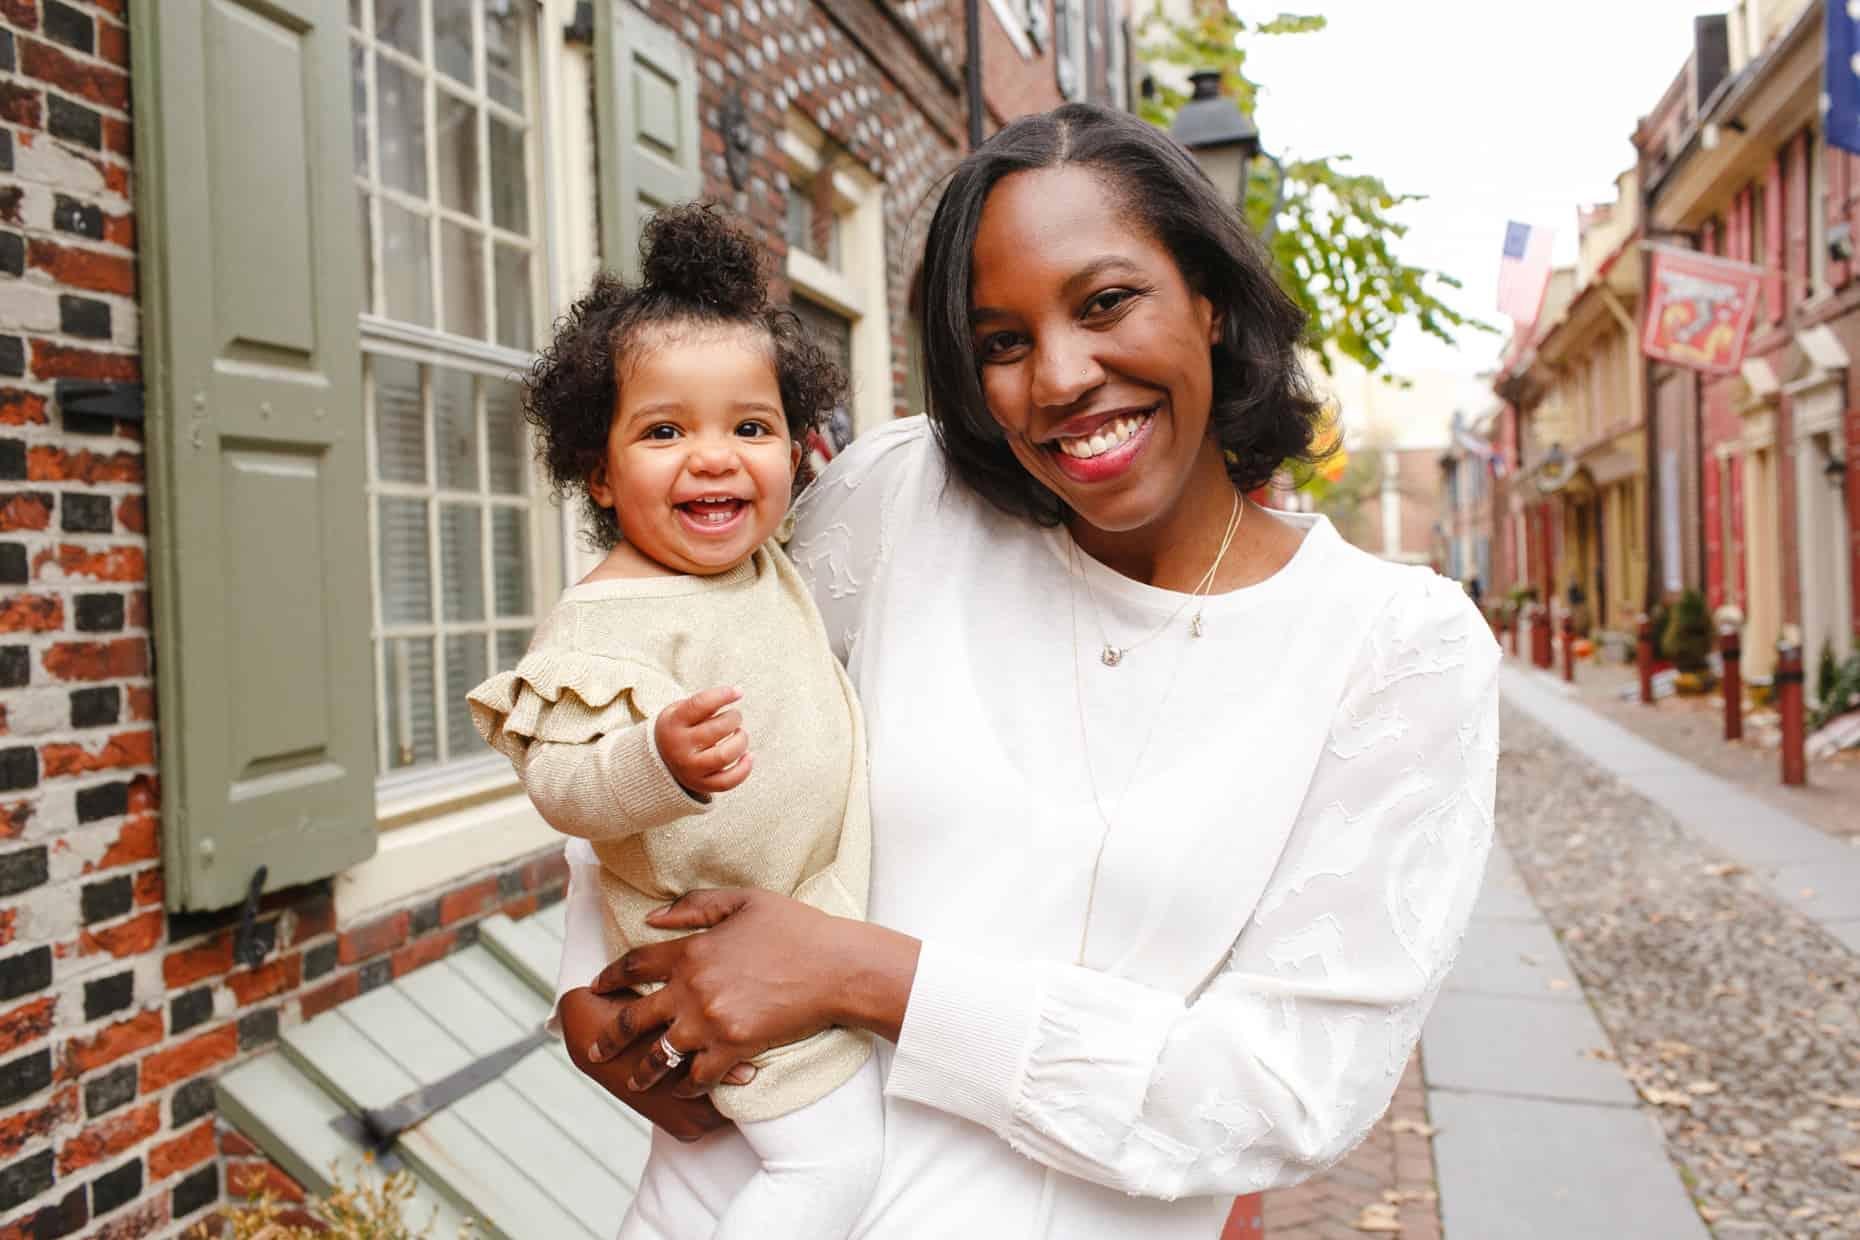 Philadelphia Family Photos Elphreth's Alley